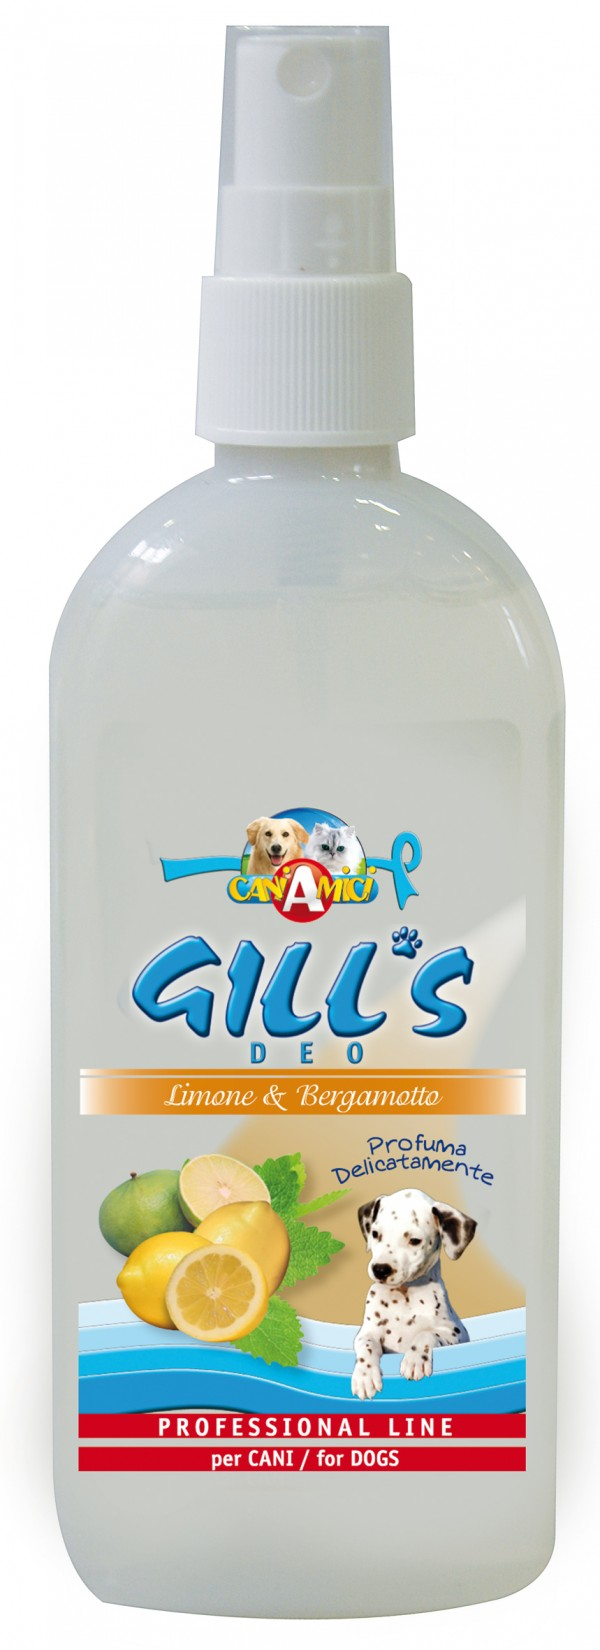 GILLS perfem limun 150 ml